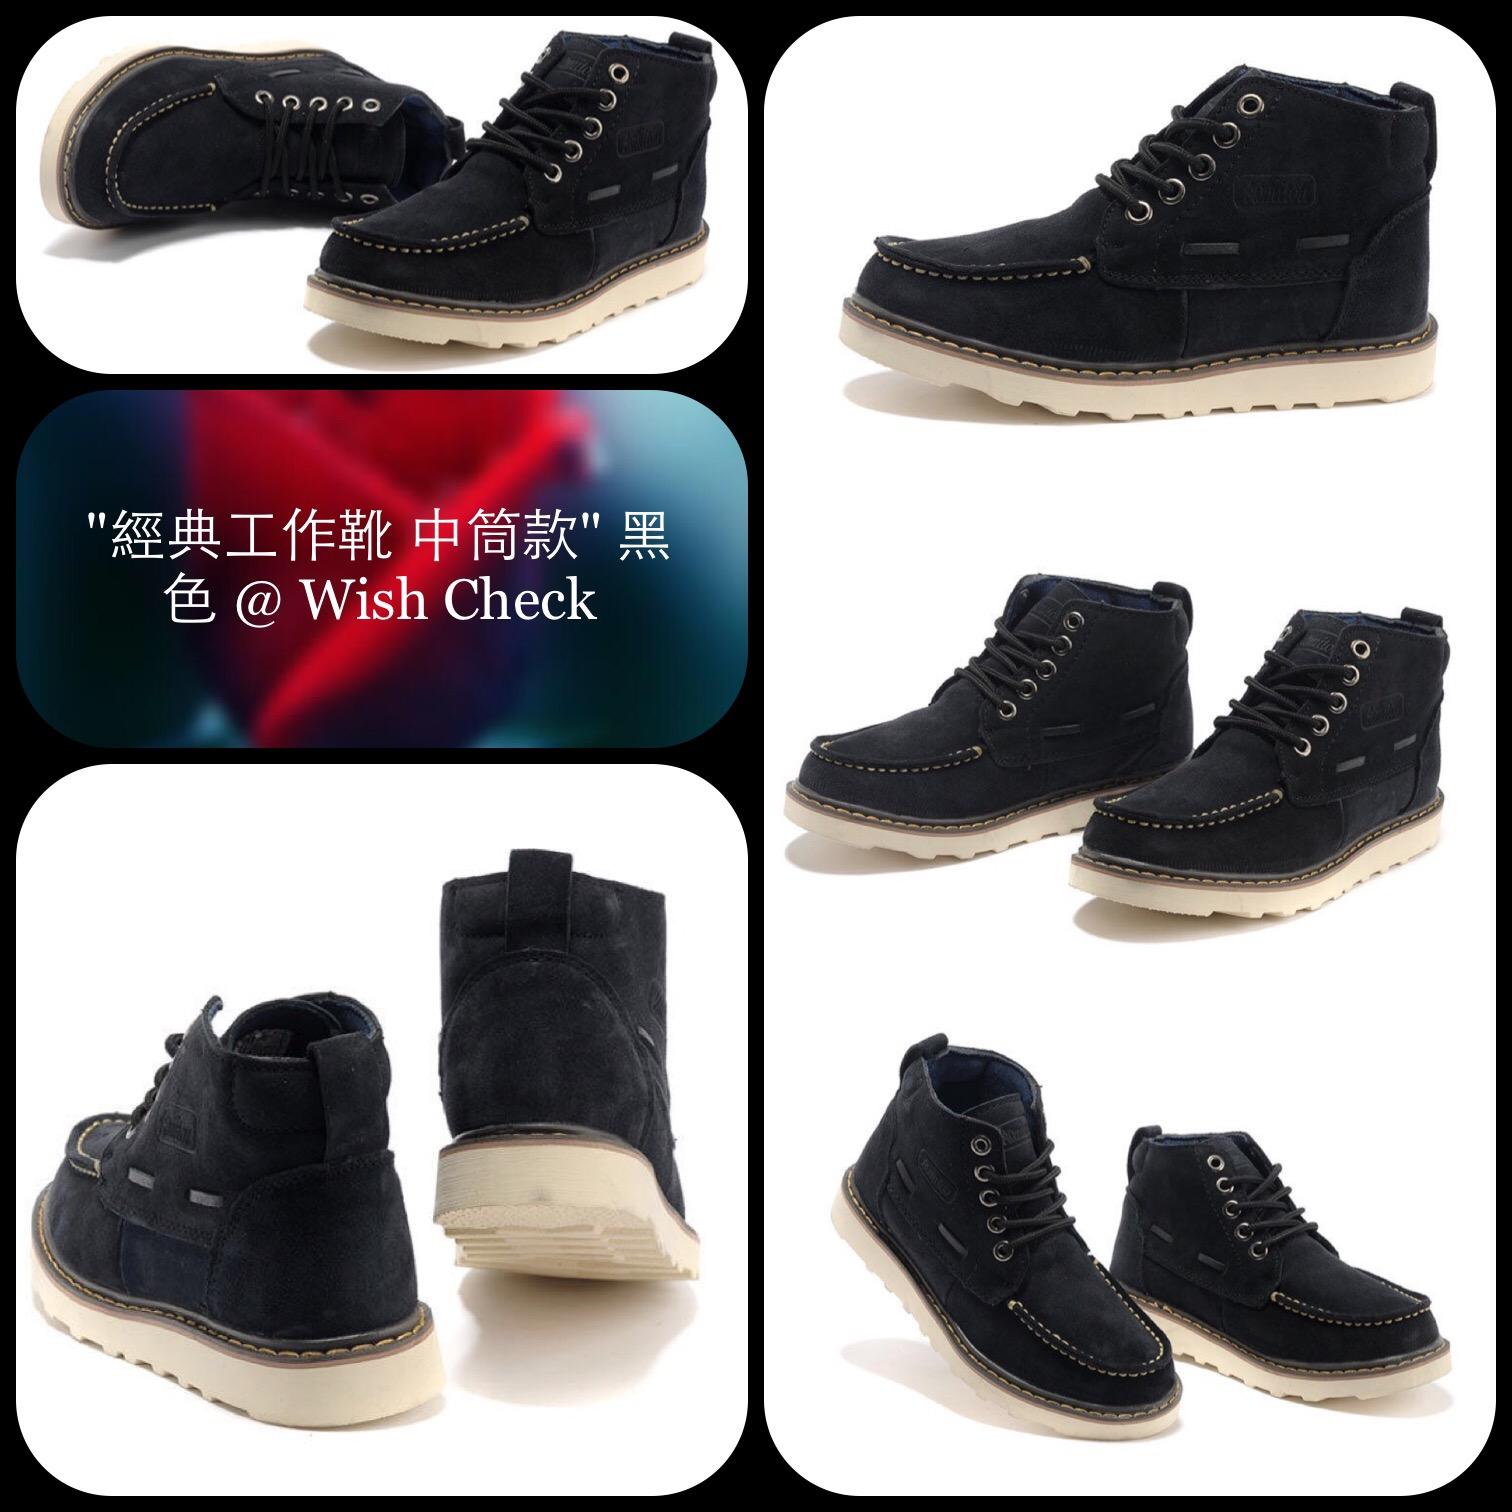 經典工作靴 – Wish Check Shop